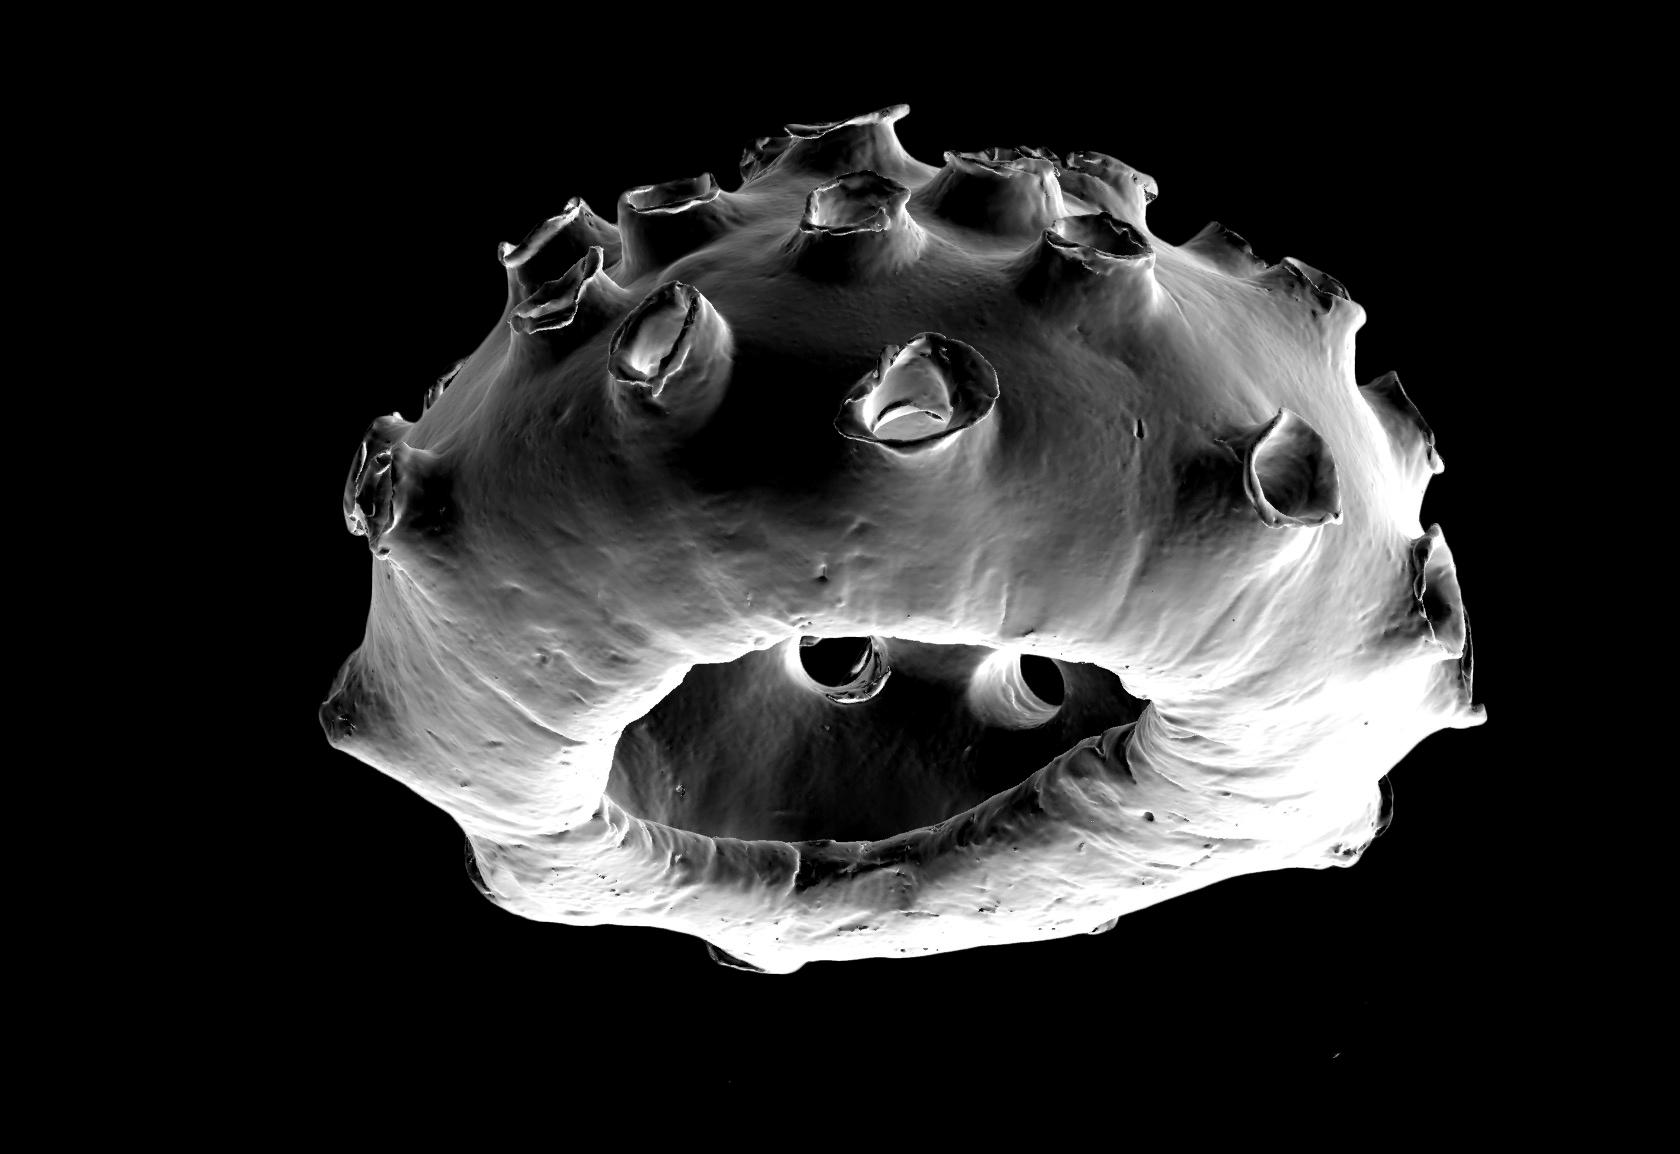 Dark Matter_1267_11-14-14.jpg